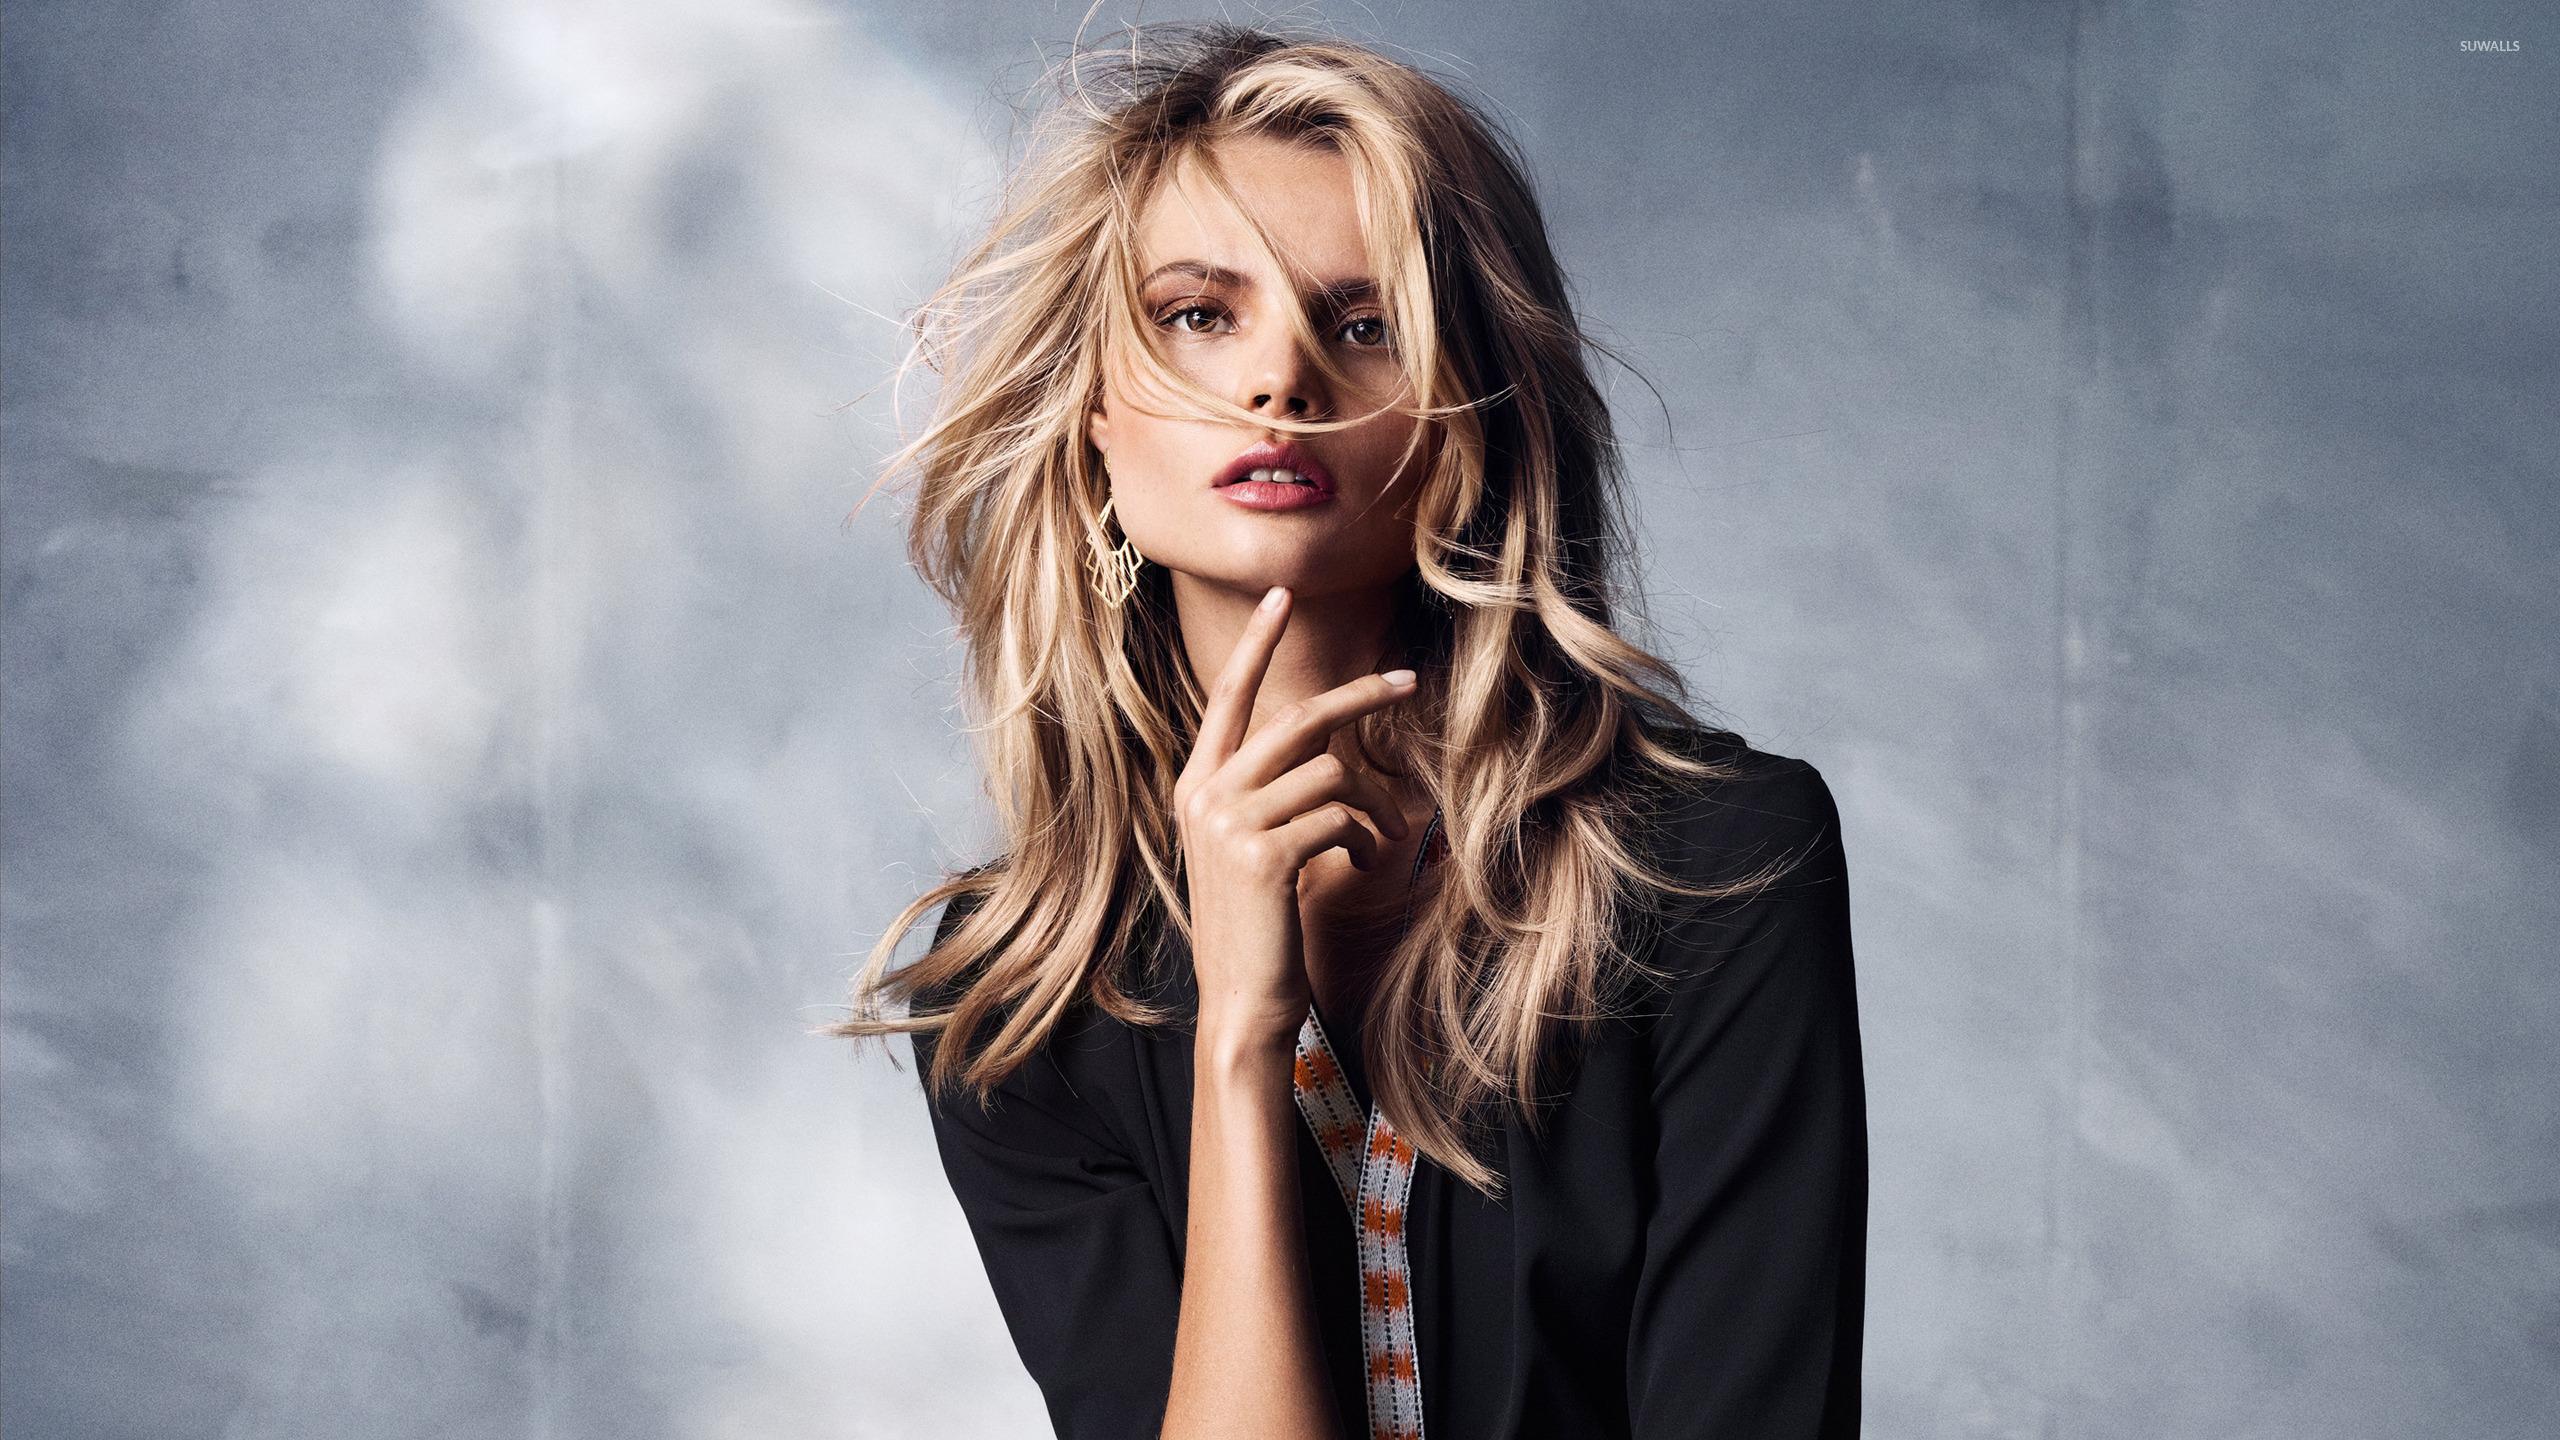 HD Quality Wallpaper | Collection: Women, 2560x1440 Magdalena Frackowiak